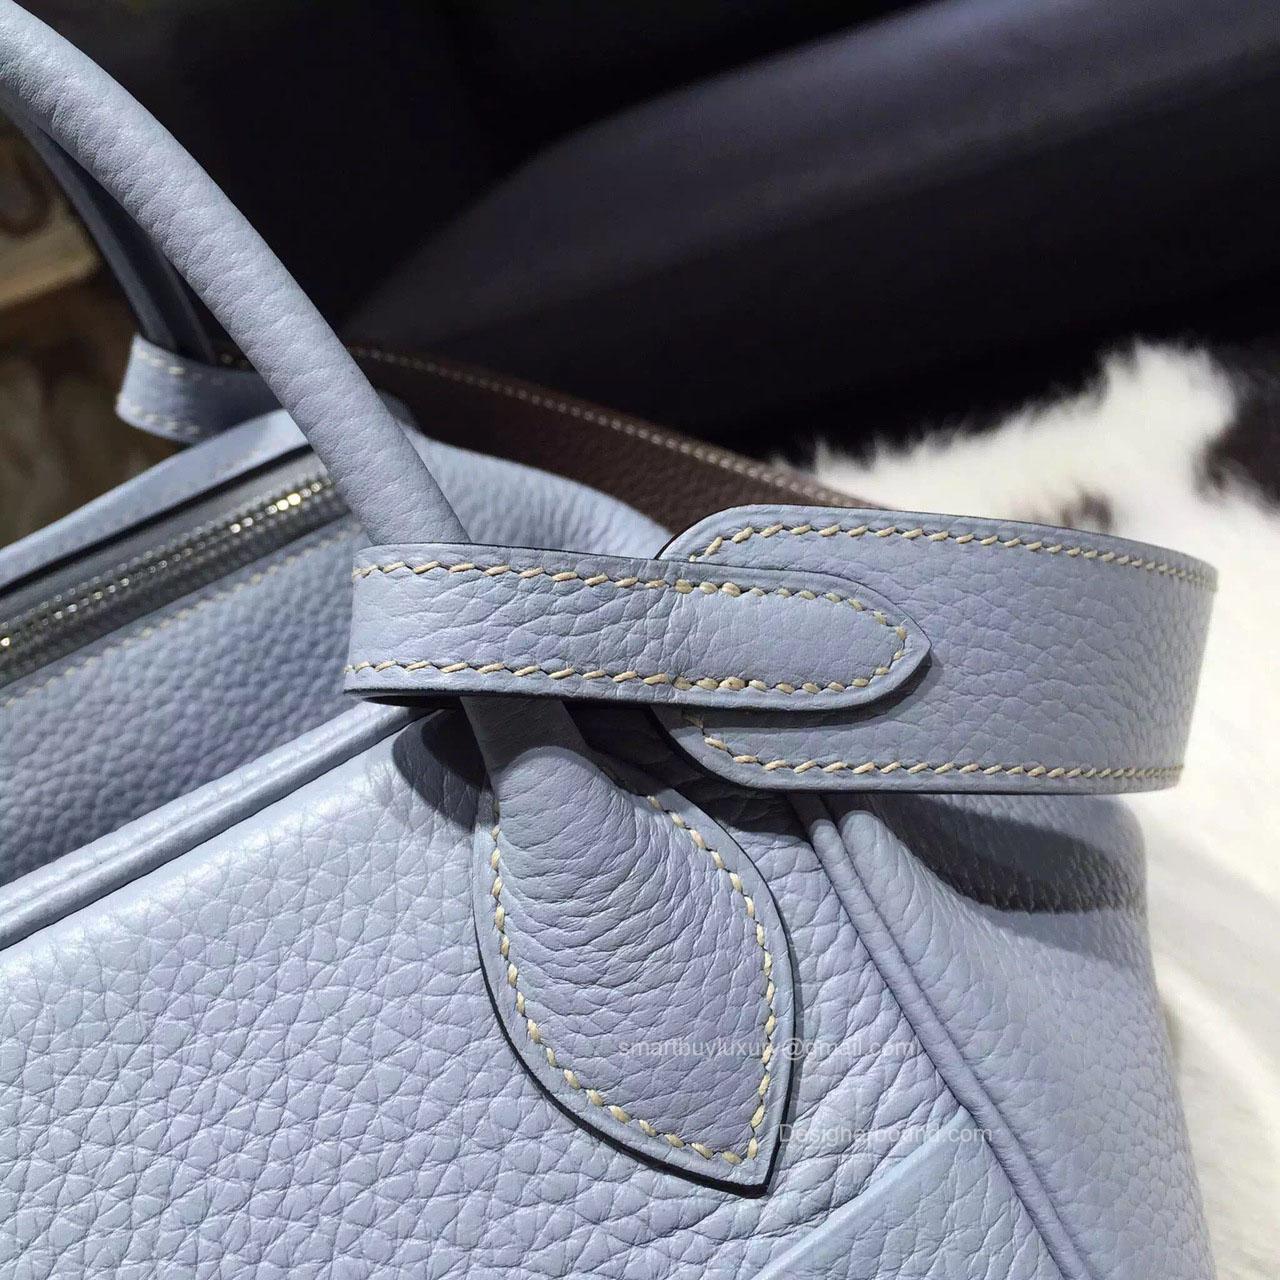 Hermes Lindy 30 Bag in Bi-Color Bleu Lin CKJ7 Taurillon Clemence ...